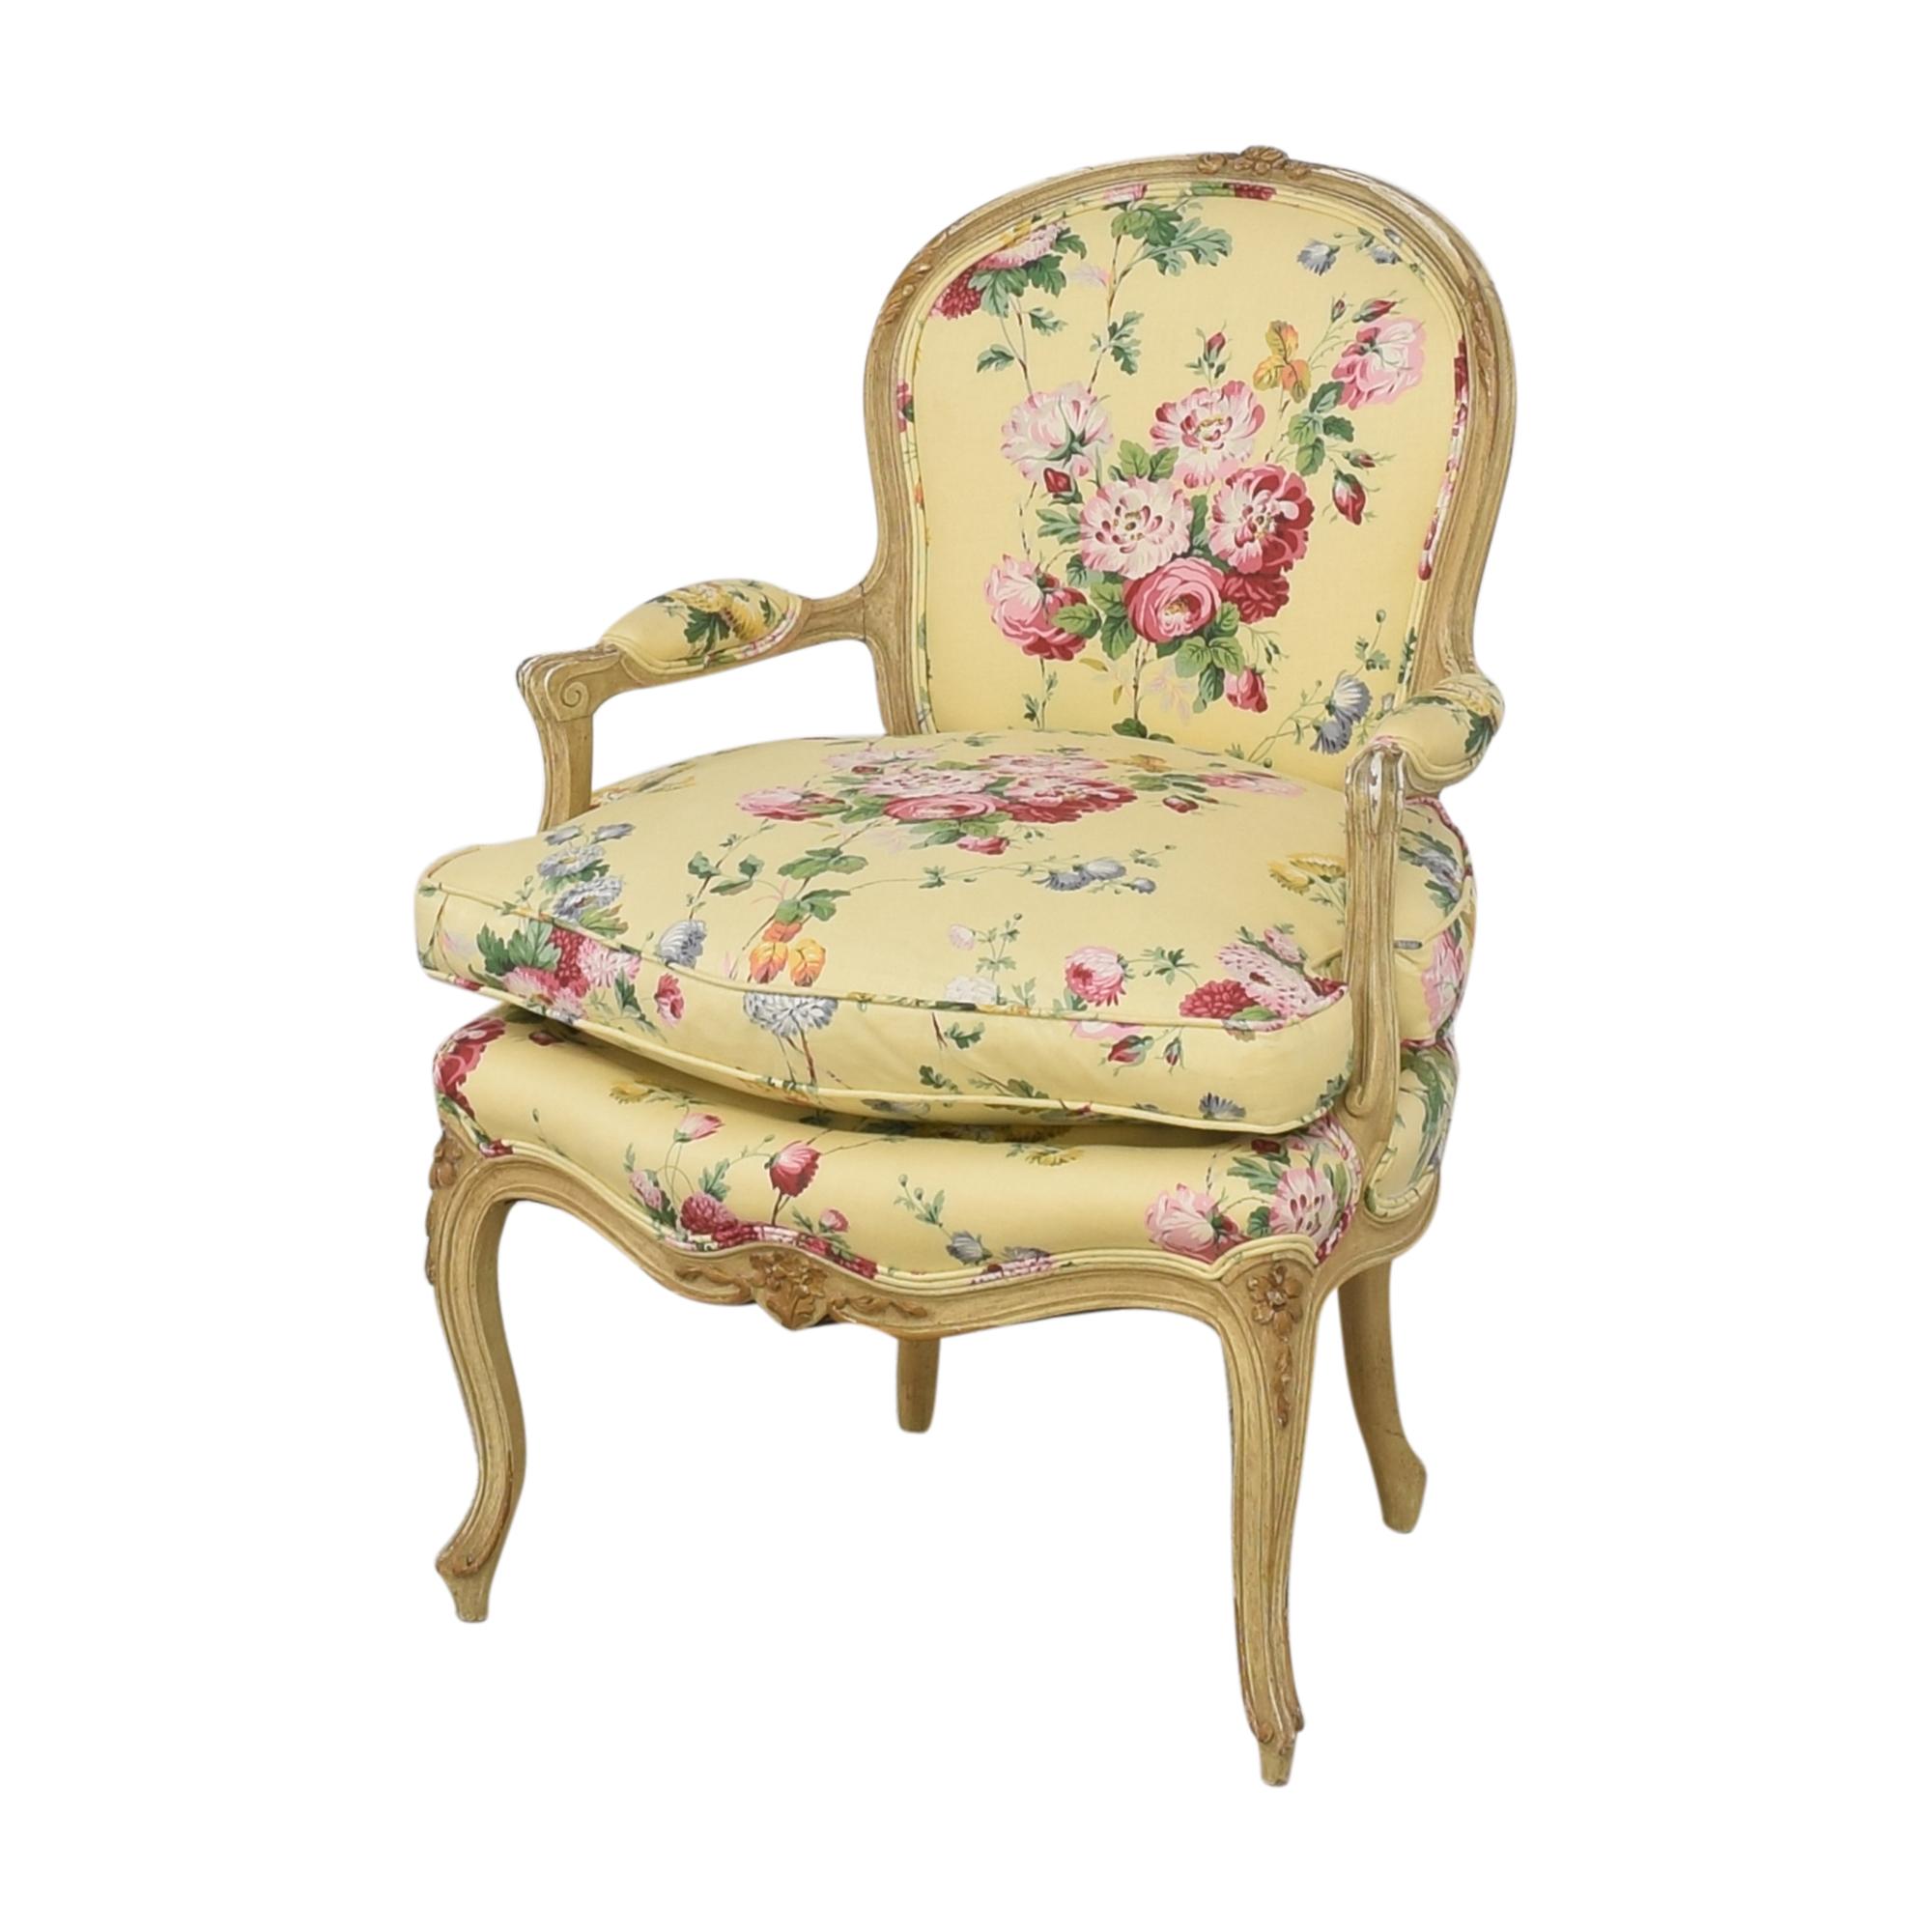 Brunschwig & Fils Brunschwig & Fils Custom Floral Chair second hand